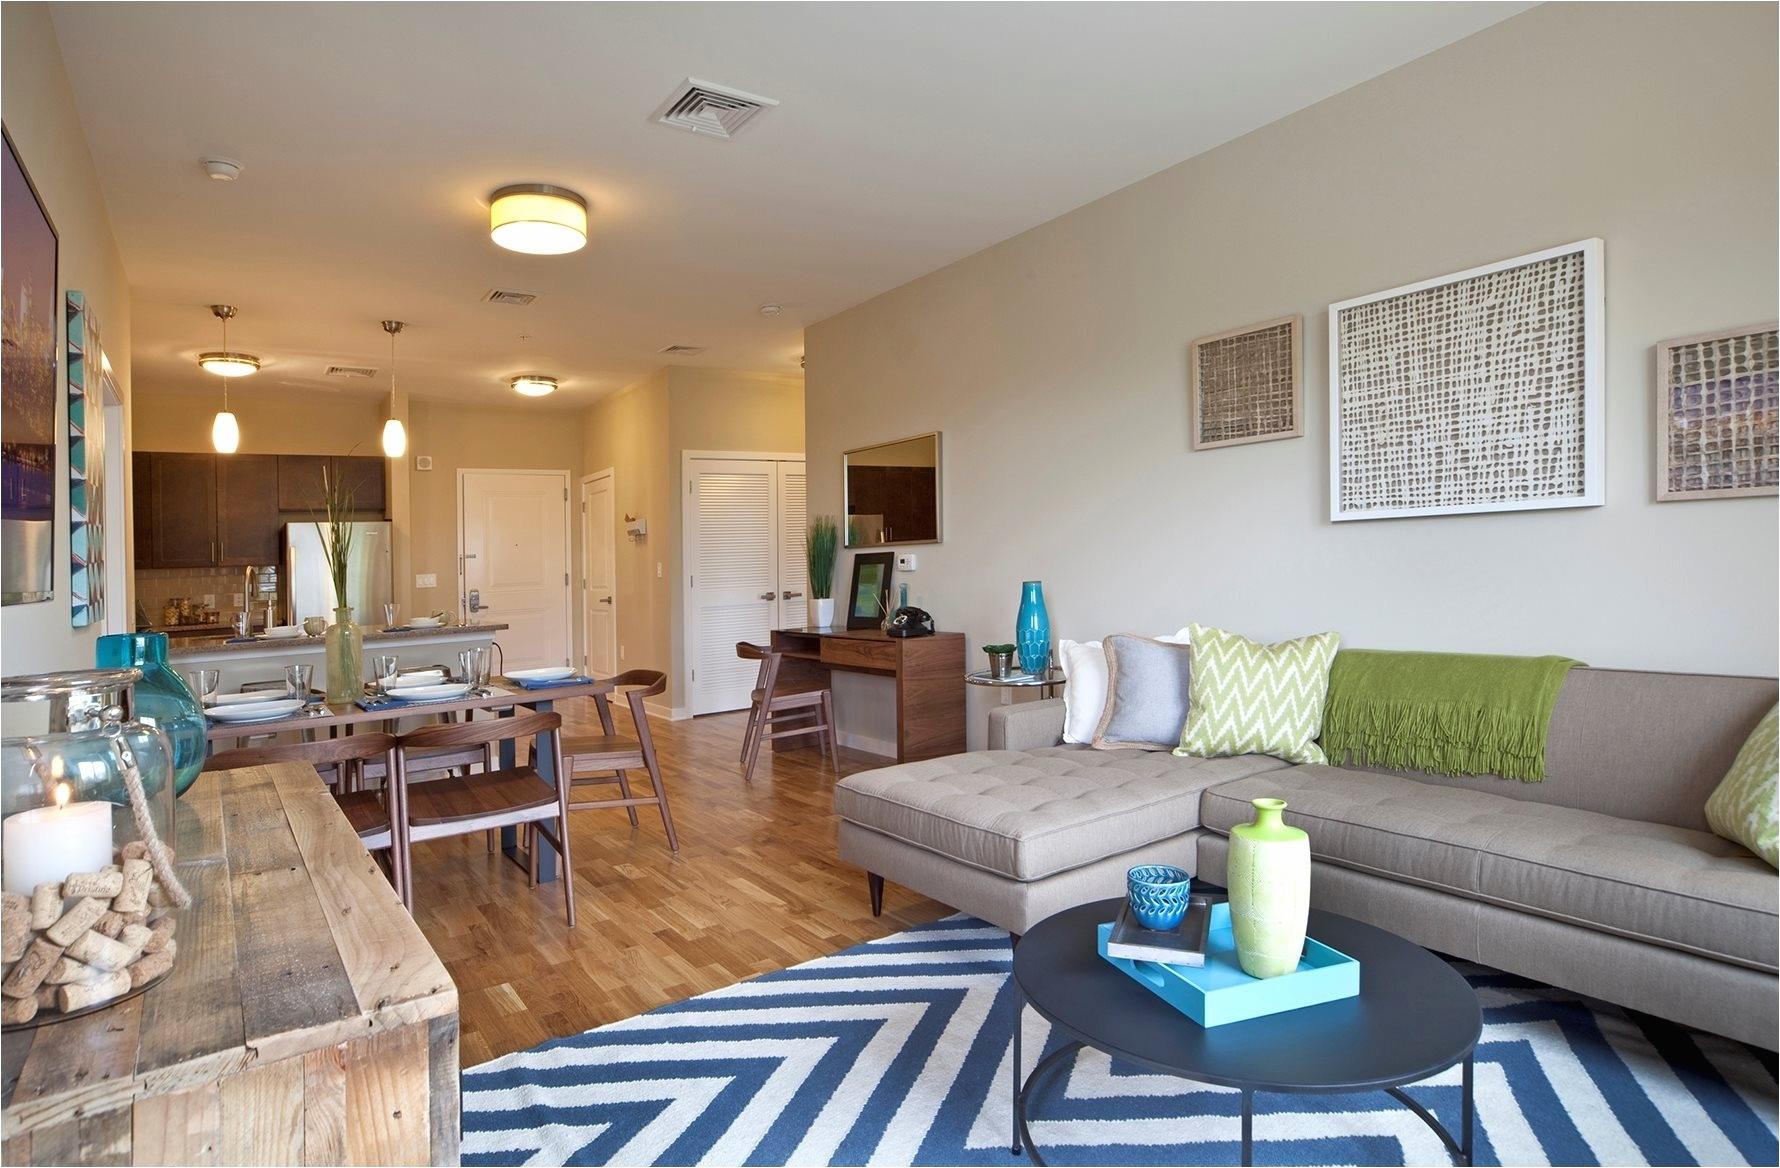 Furniture Stores In Elizabeth Nj 3 Bedroom 2 Bath Apartments For